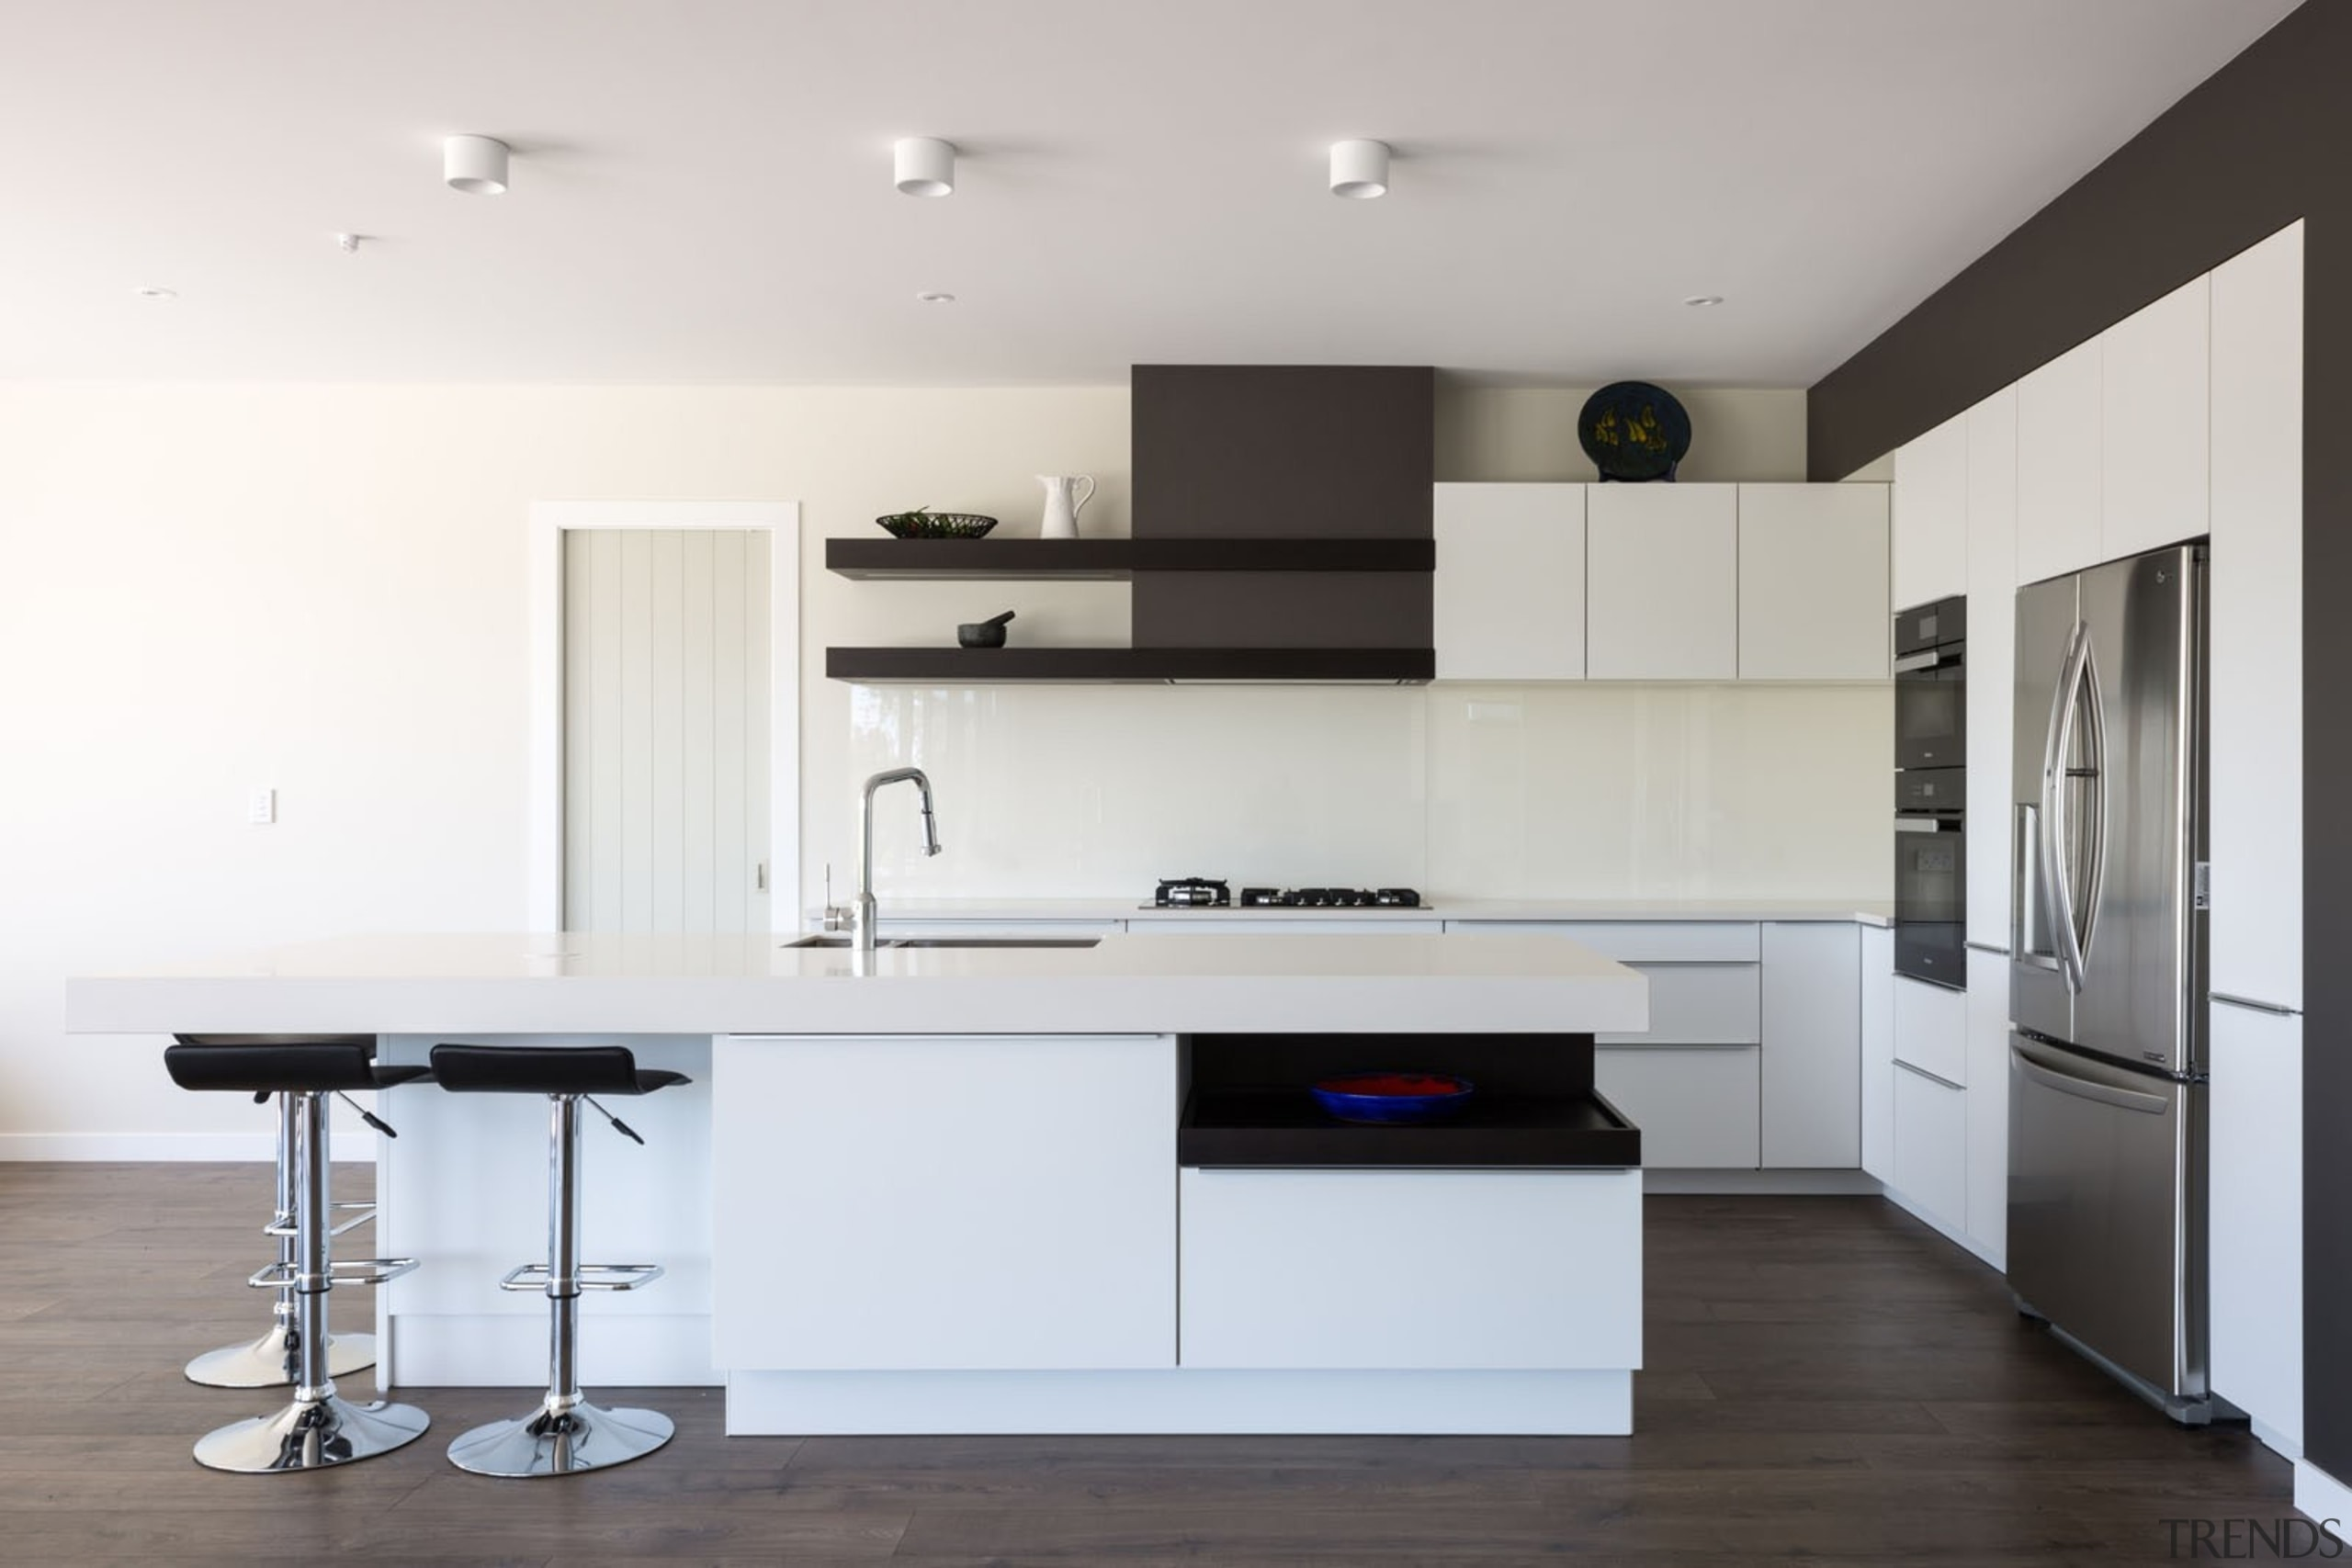 IMGL9856-9 - Dairy Flat Kitchen - countertop | countertop, floor, furniture, interior design, kitchen, product design, room, white